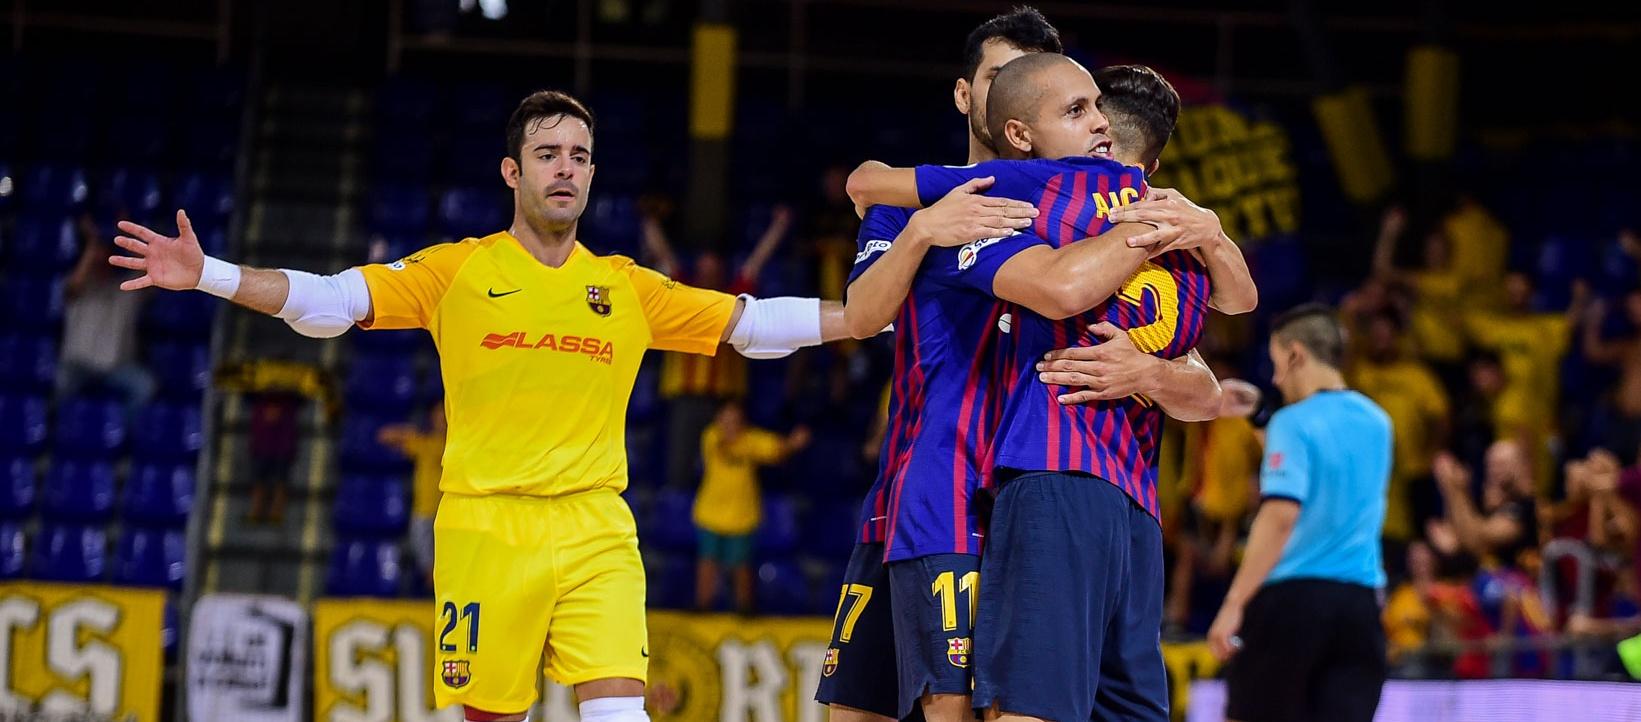 Els horaris de la Final Four UEFA Futsal Champions League